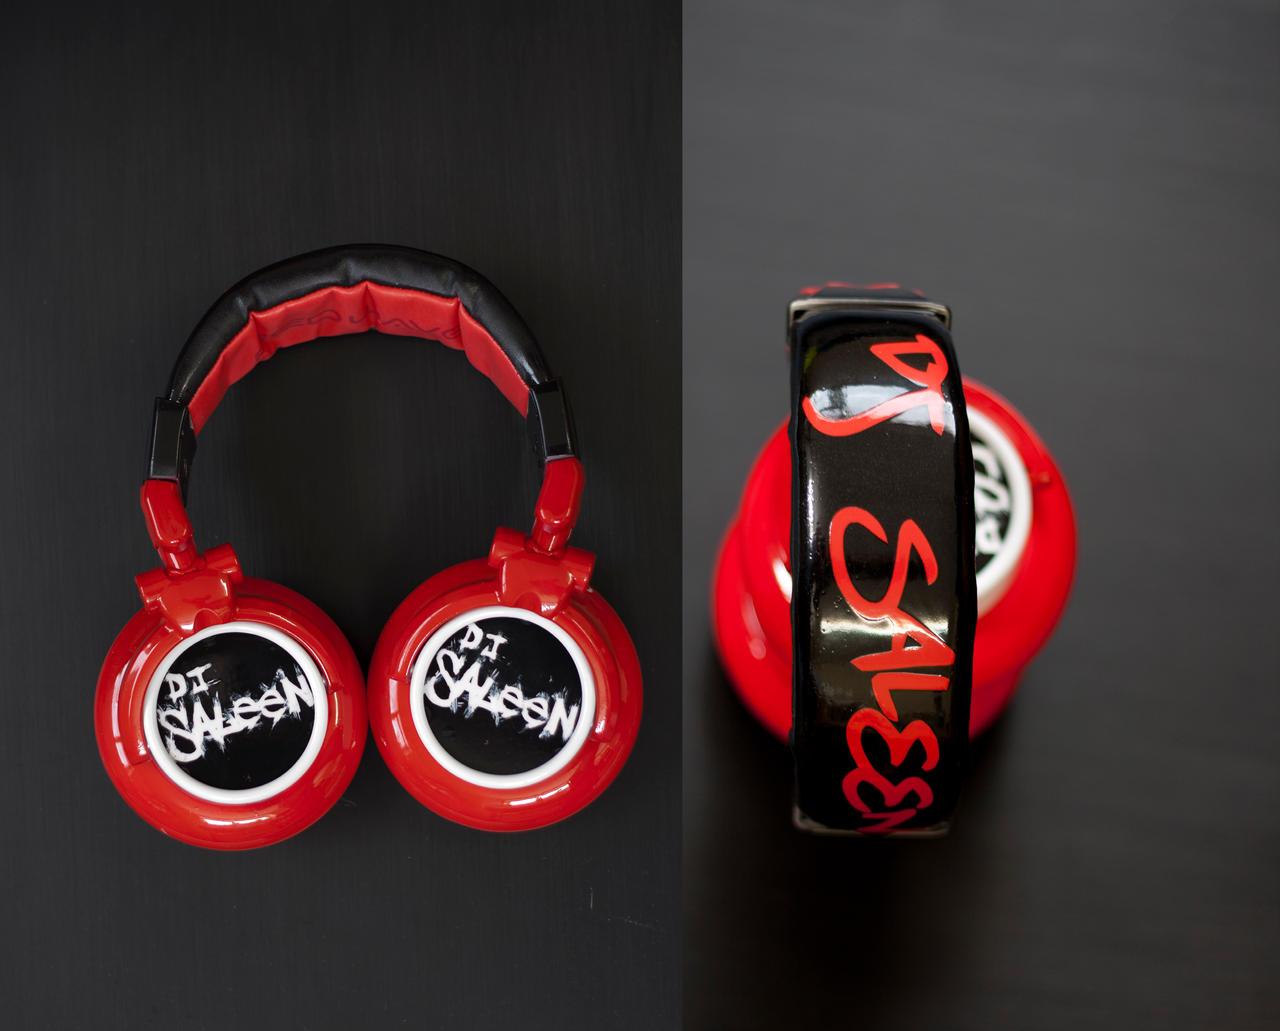 Red Wave newmark dj headphones by DJ-JFunk